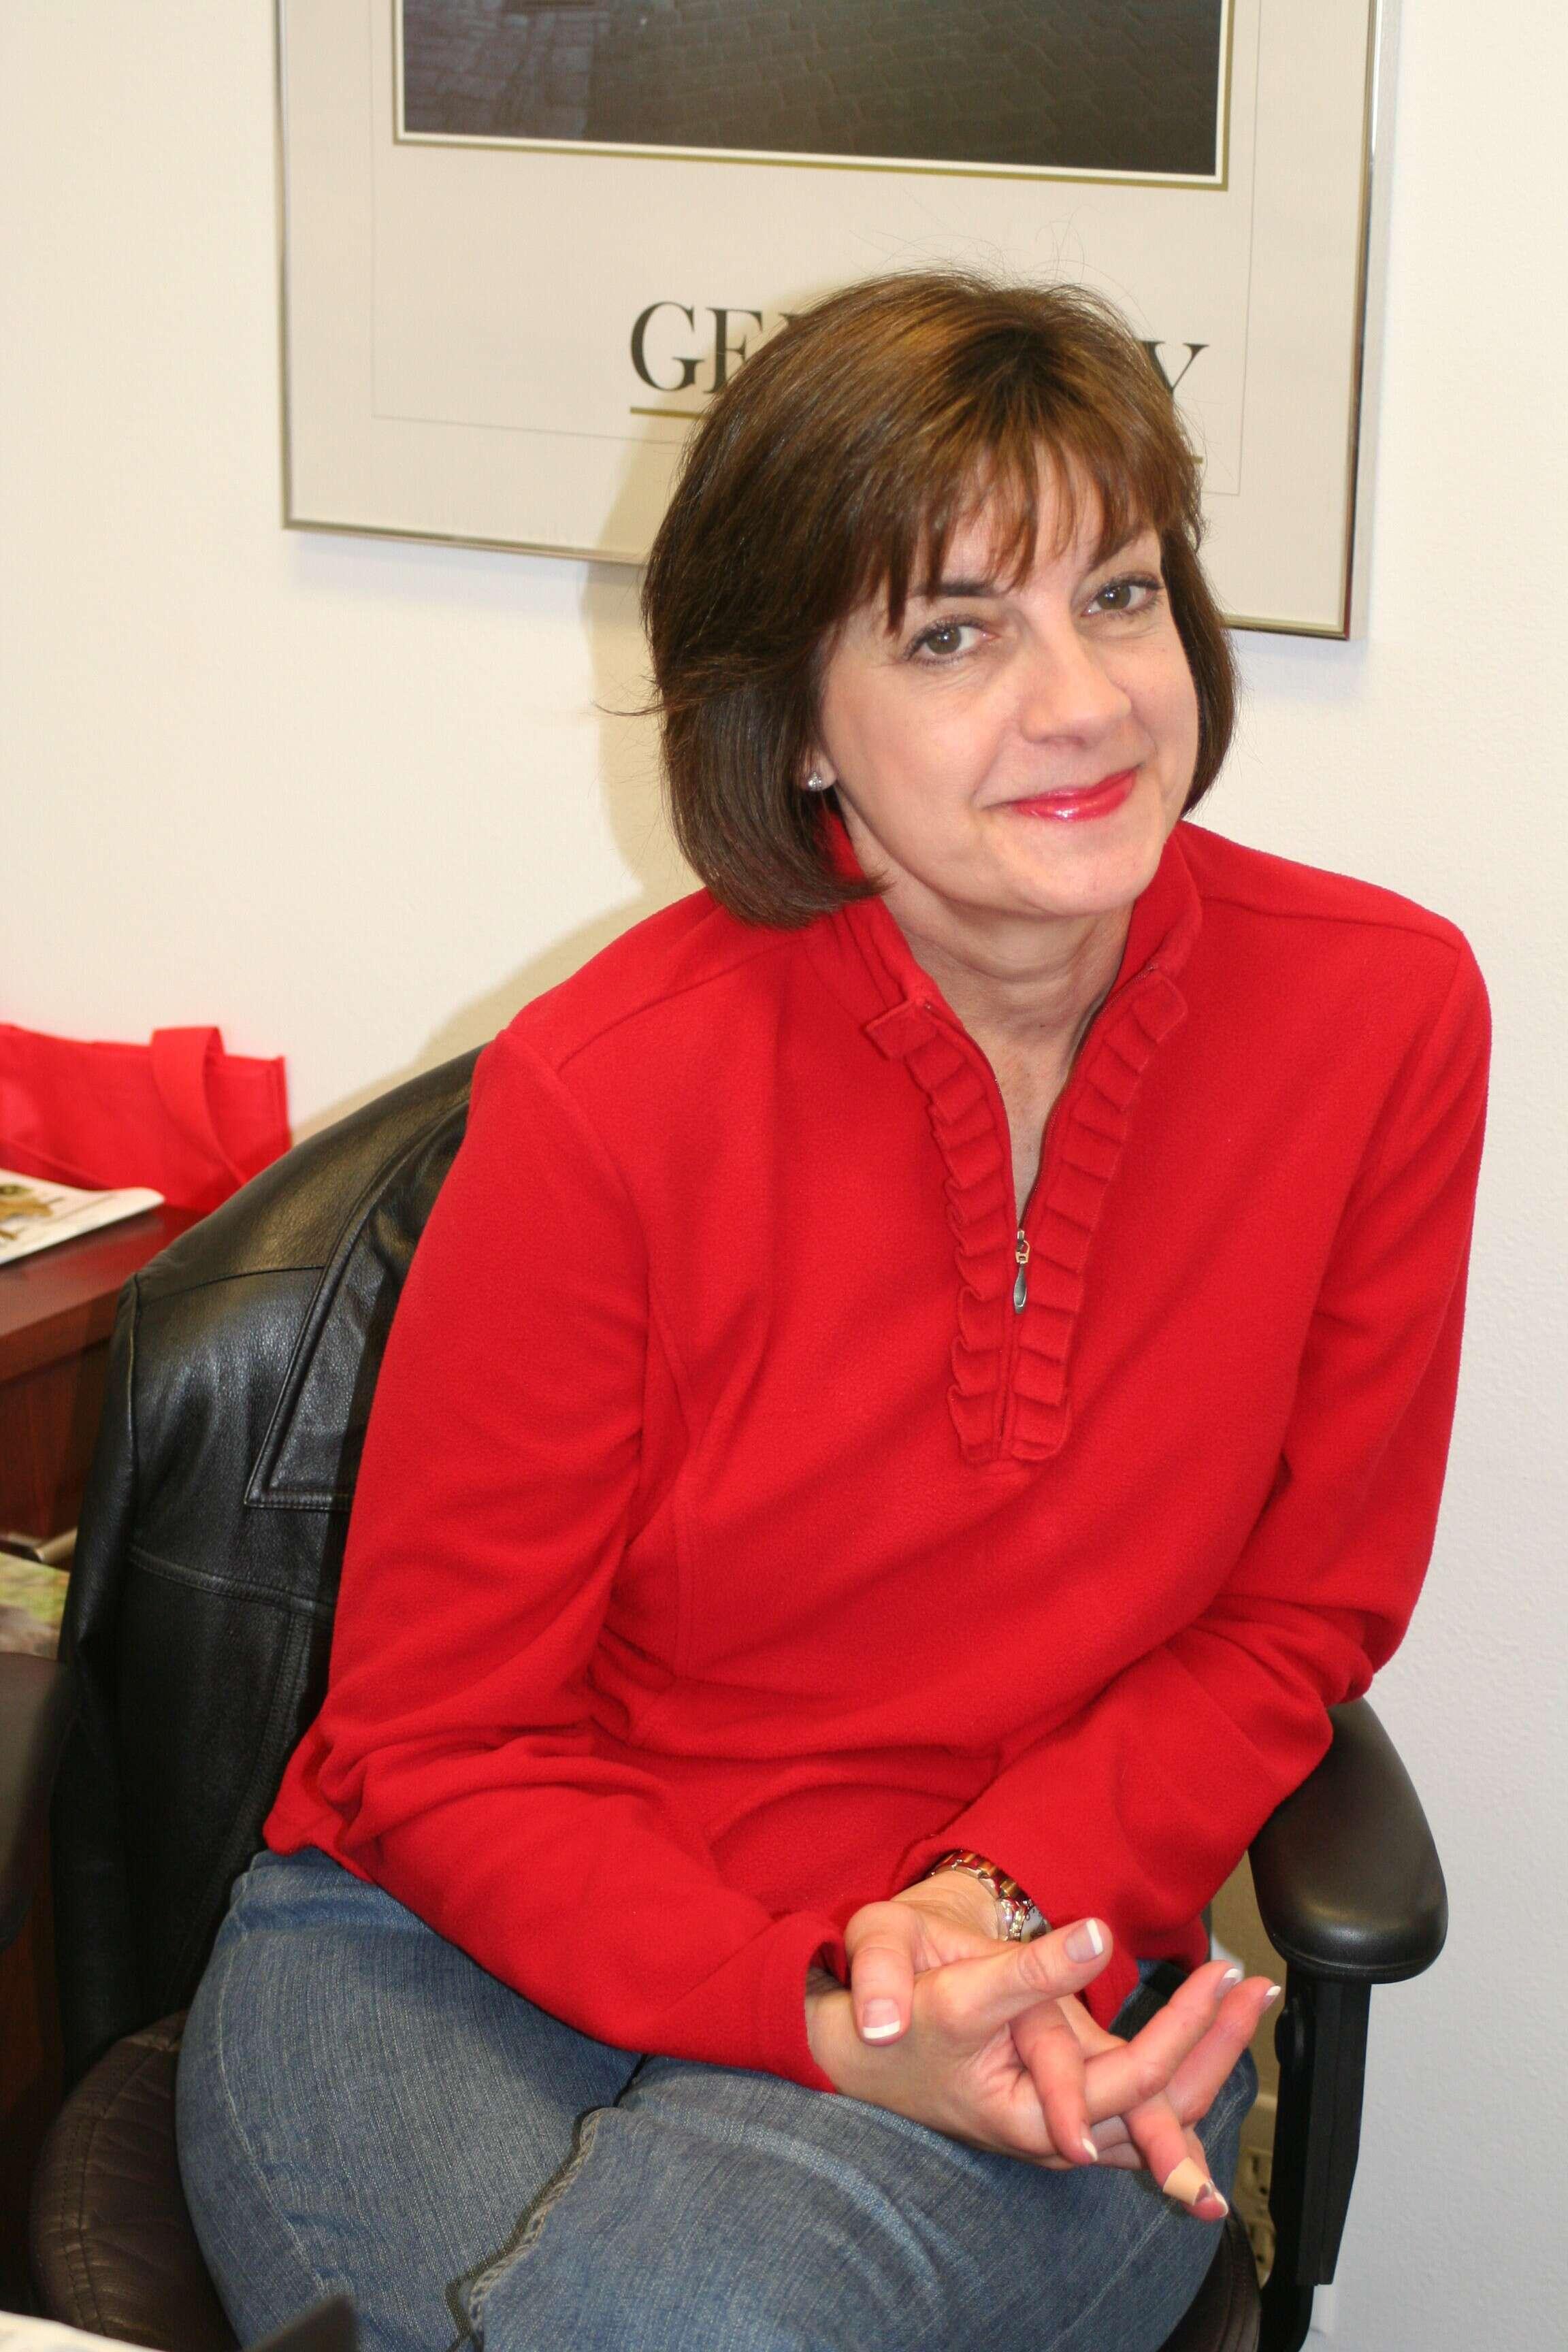 Cherie Bassham